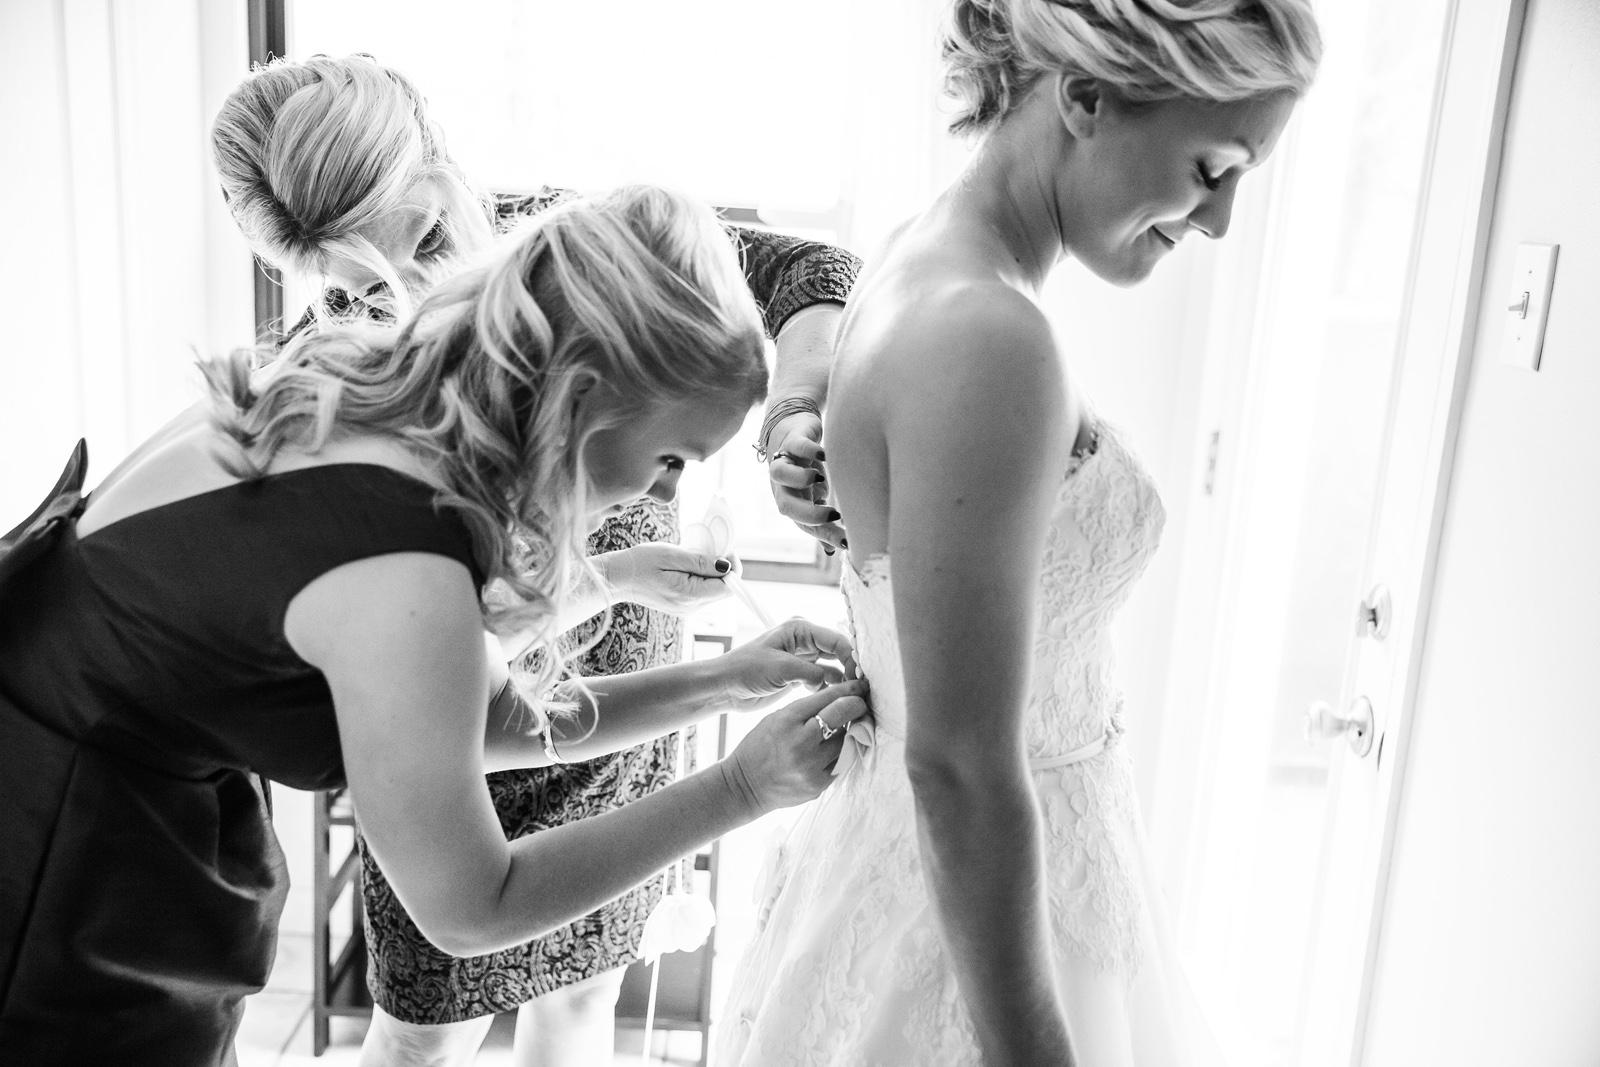 St Louis Winter Wedding Photography_20141115_14034475.jpg